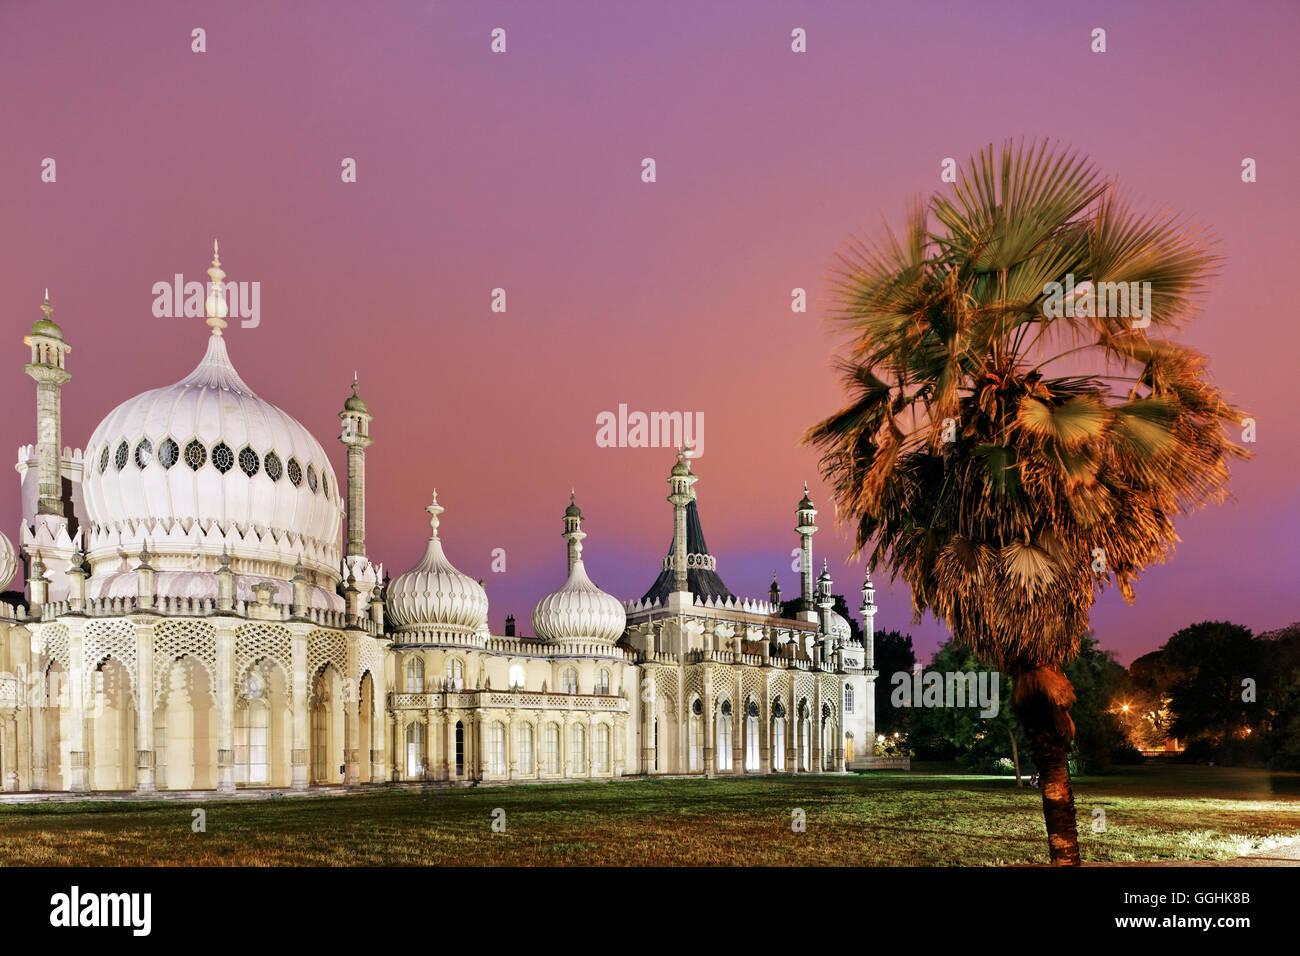 Royal Pavilion, Brighton, East Sussex, Angleterre, Grande-Bretagne Photo Stock